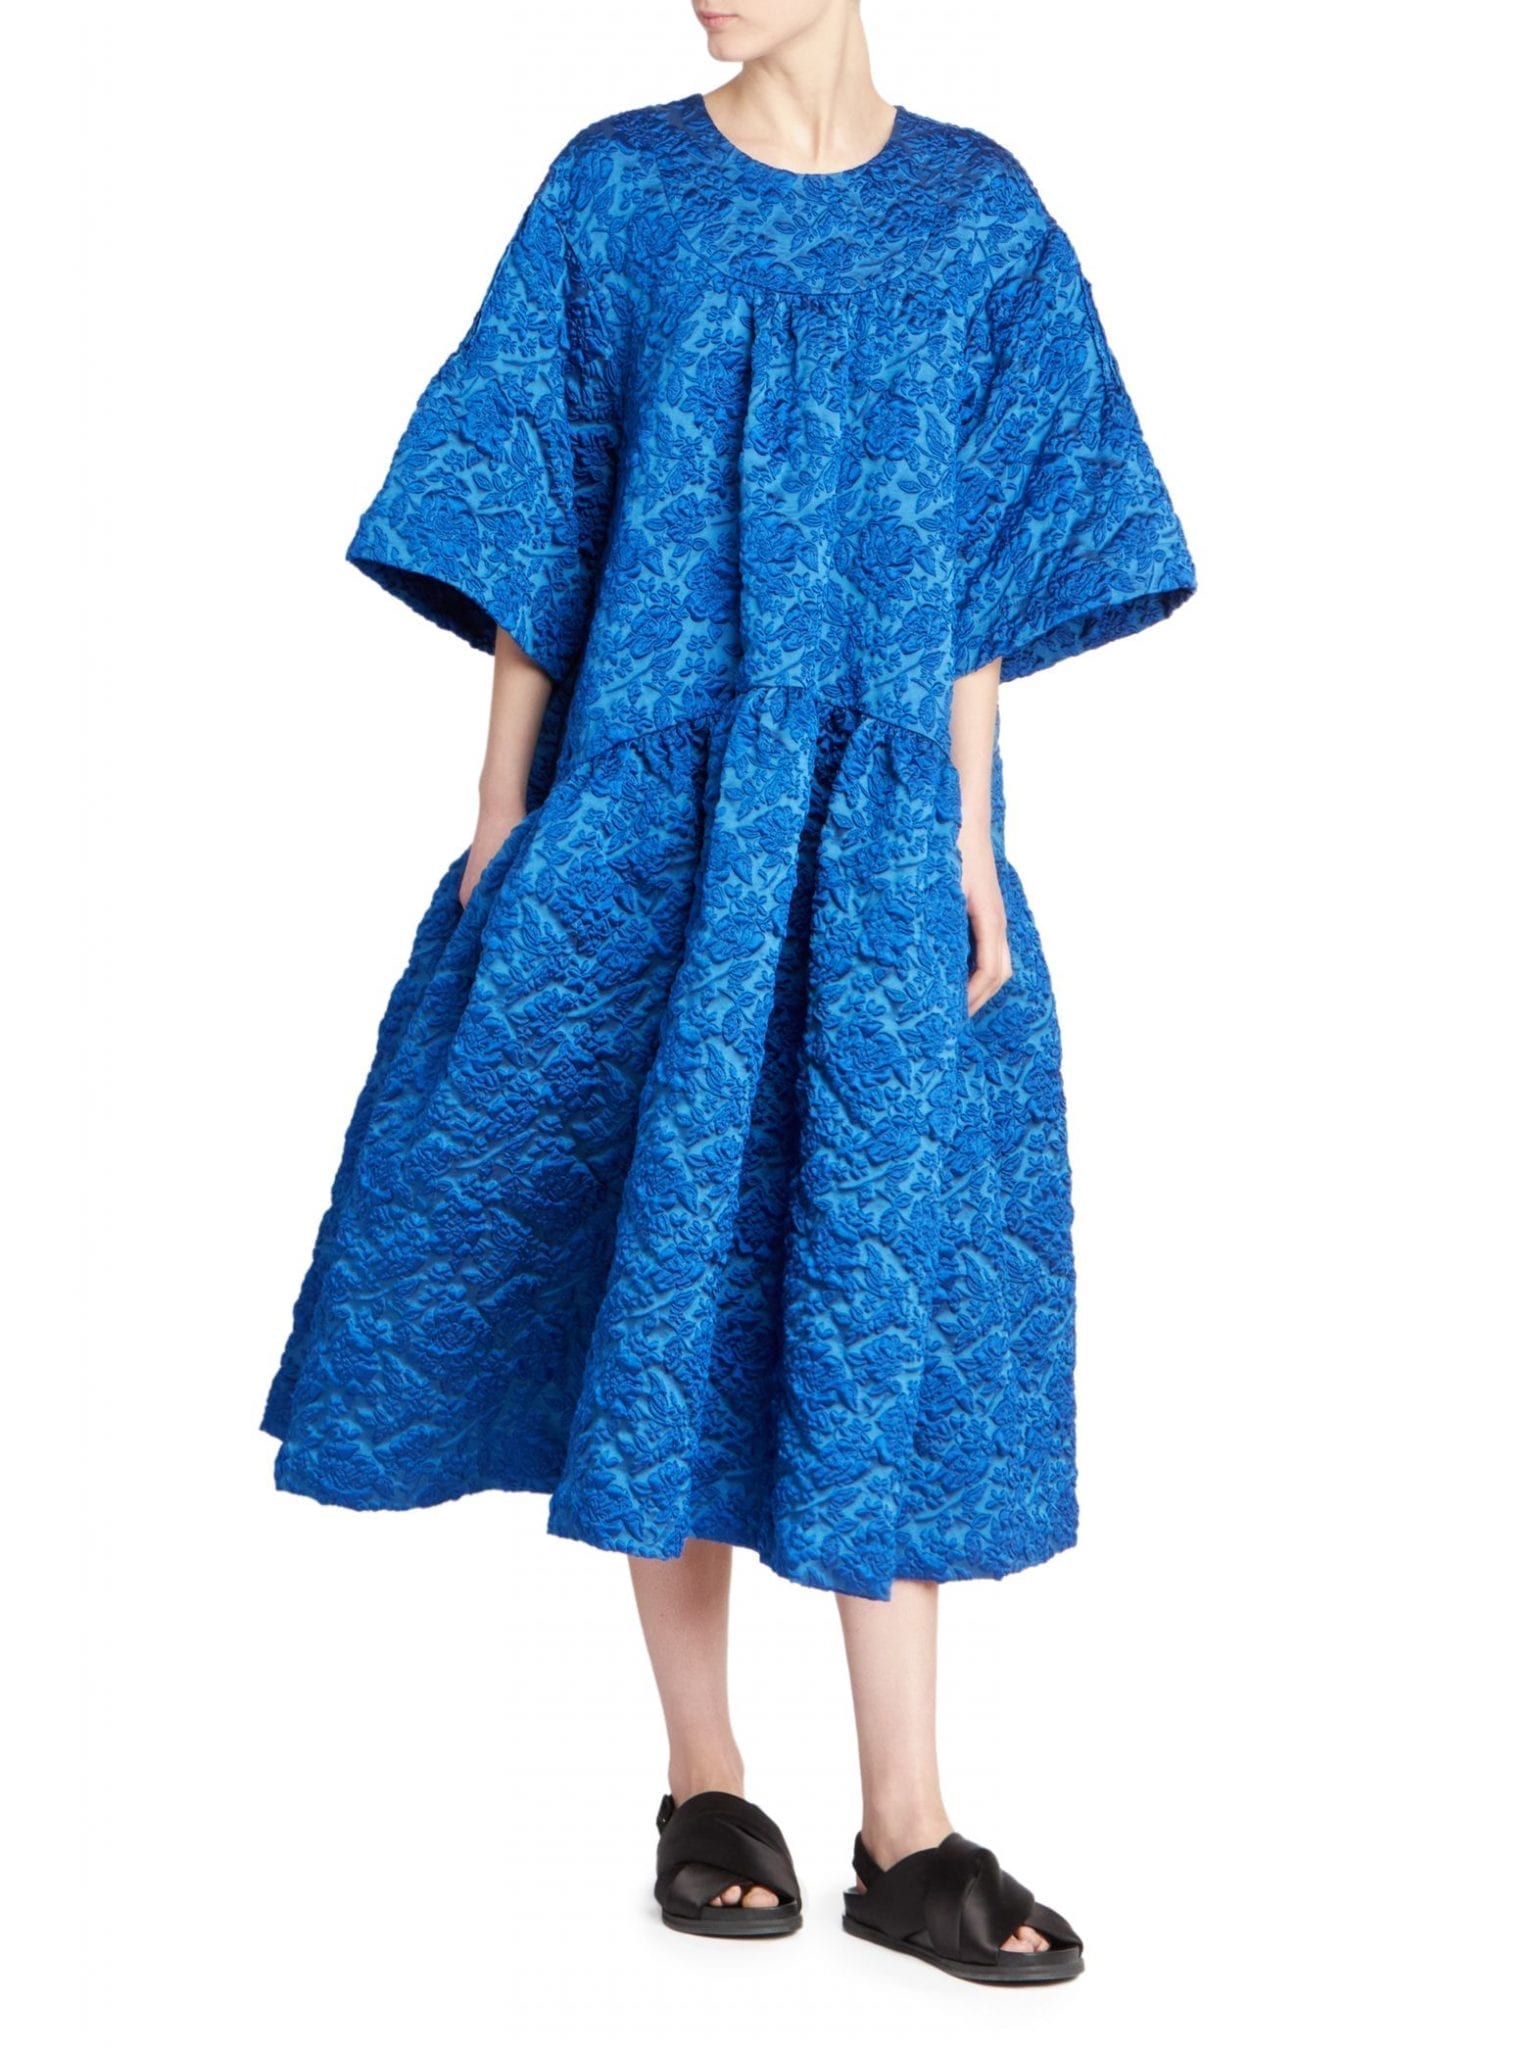 SIMONE ROCHA Cloque Drop-Waist Dress